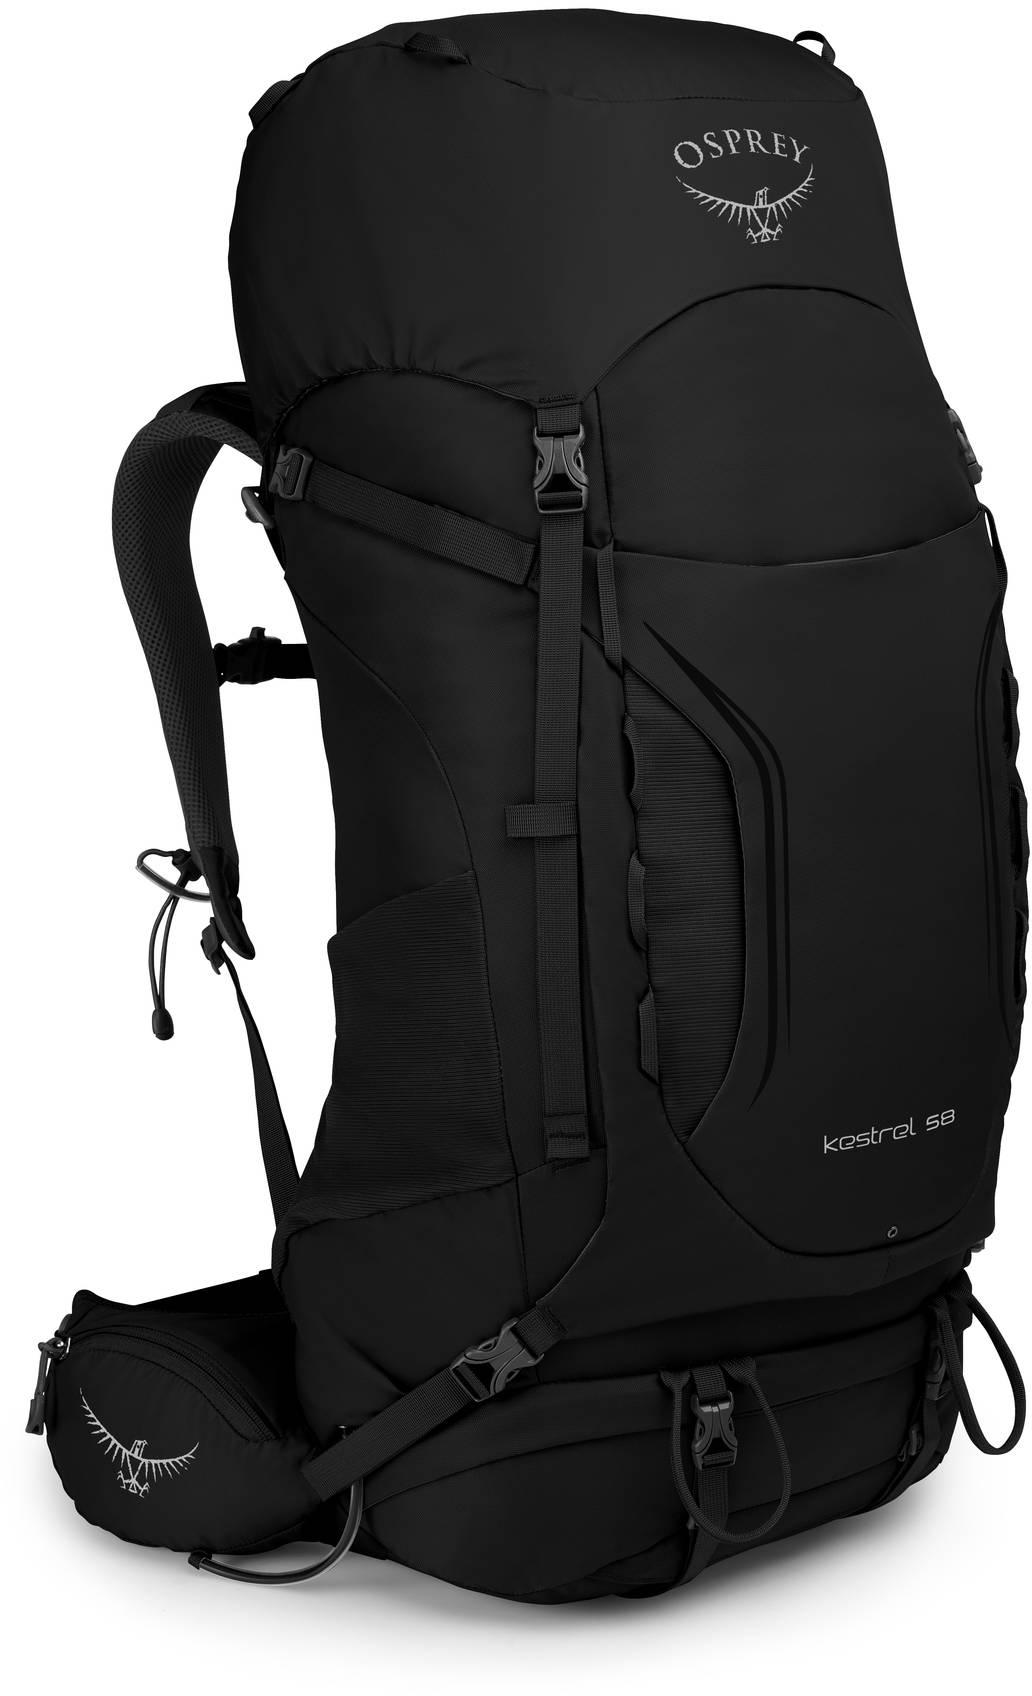 Kestrel Рюкзак туристический Osprey Kestrel 58 Black (2019) Kestrel_58_S19_Side_Black_web.jpg